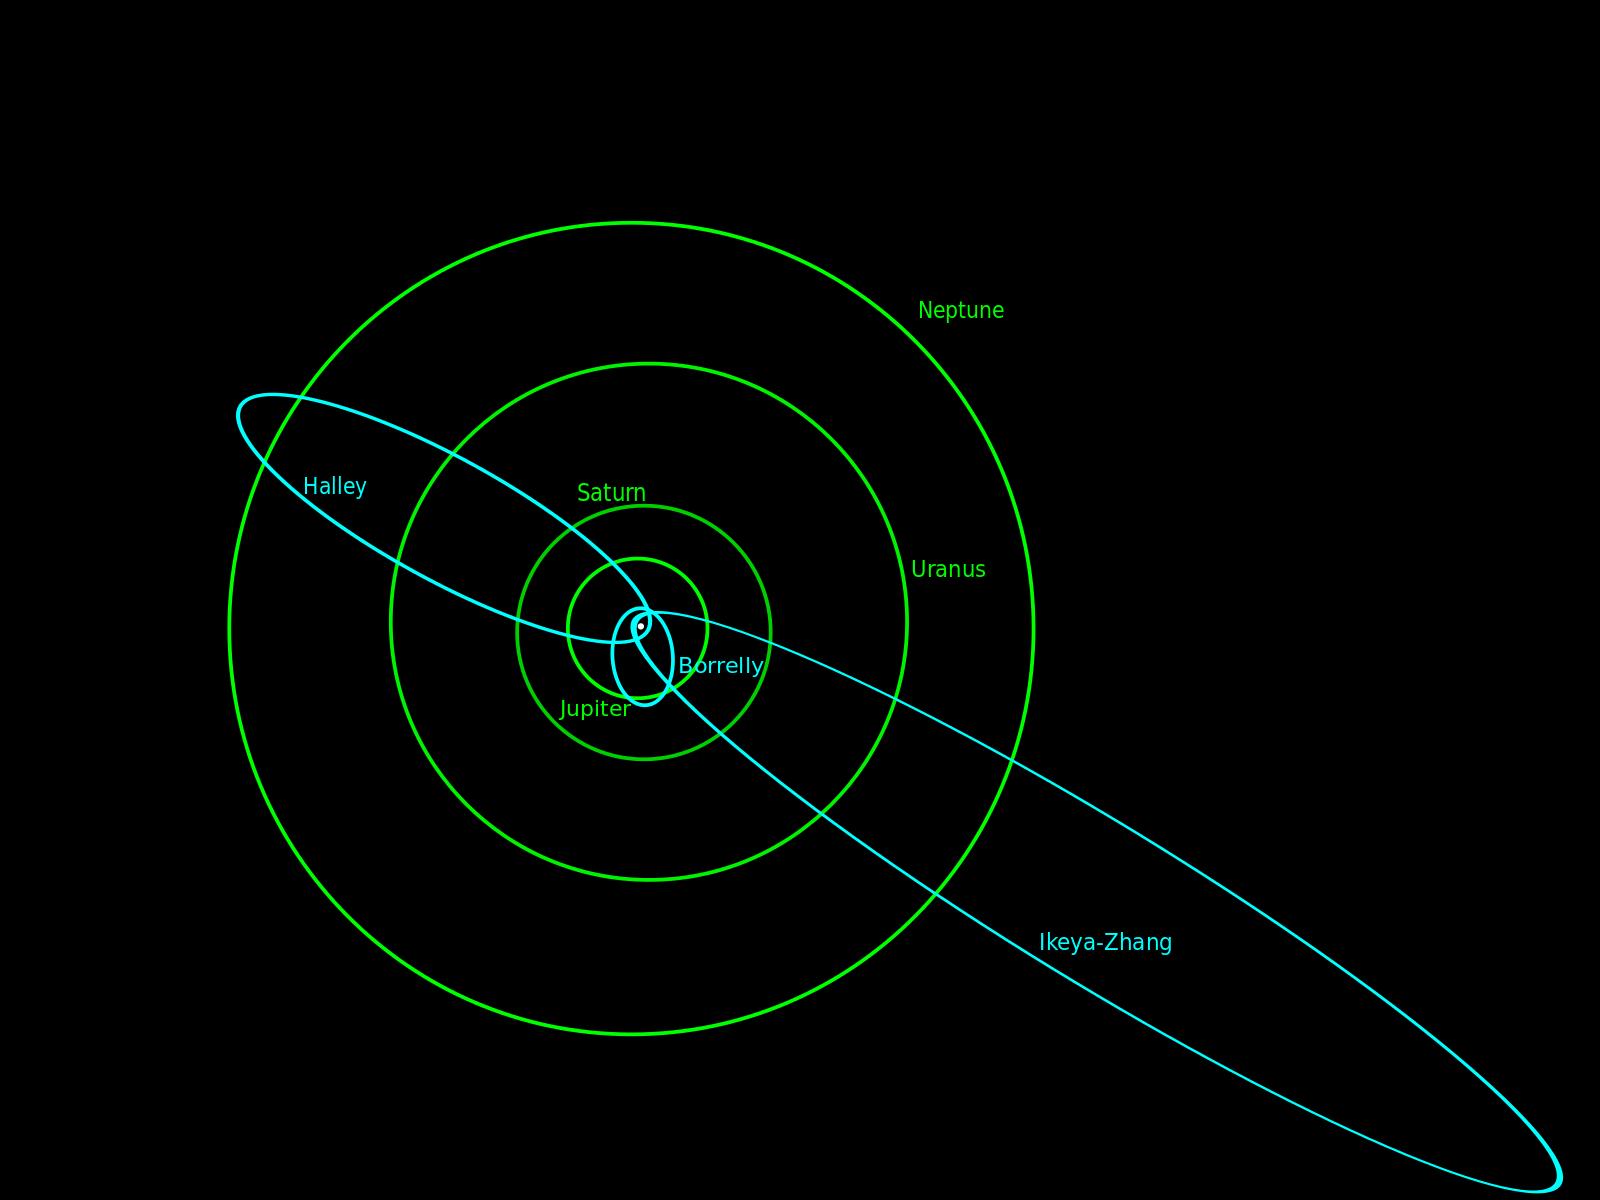 Orbits of 3 periodic comets: Halley, Borrelly and Ikeya-Zhang. Image credit: wikimedia user Morgan Phoenix , CC BY 3.0 A-SA